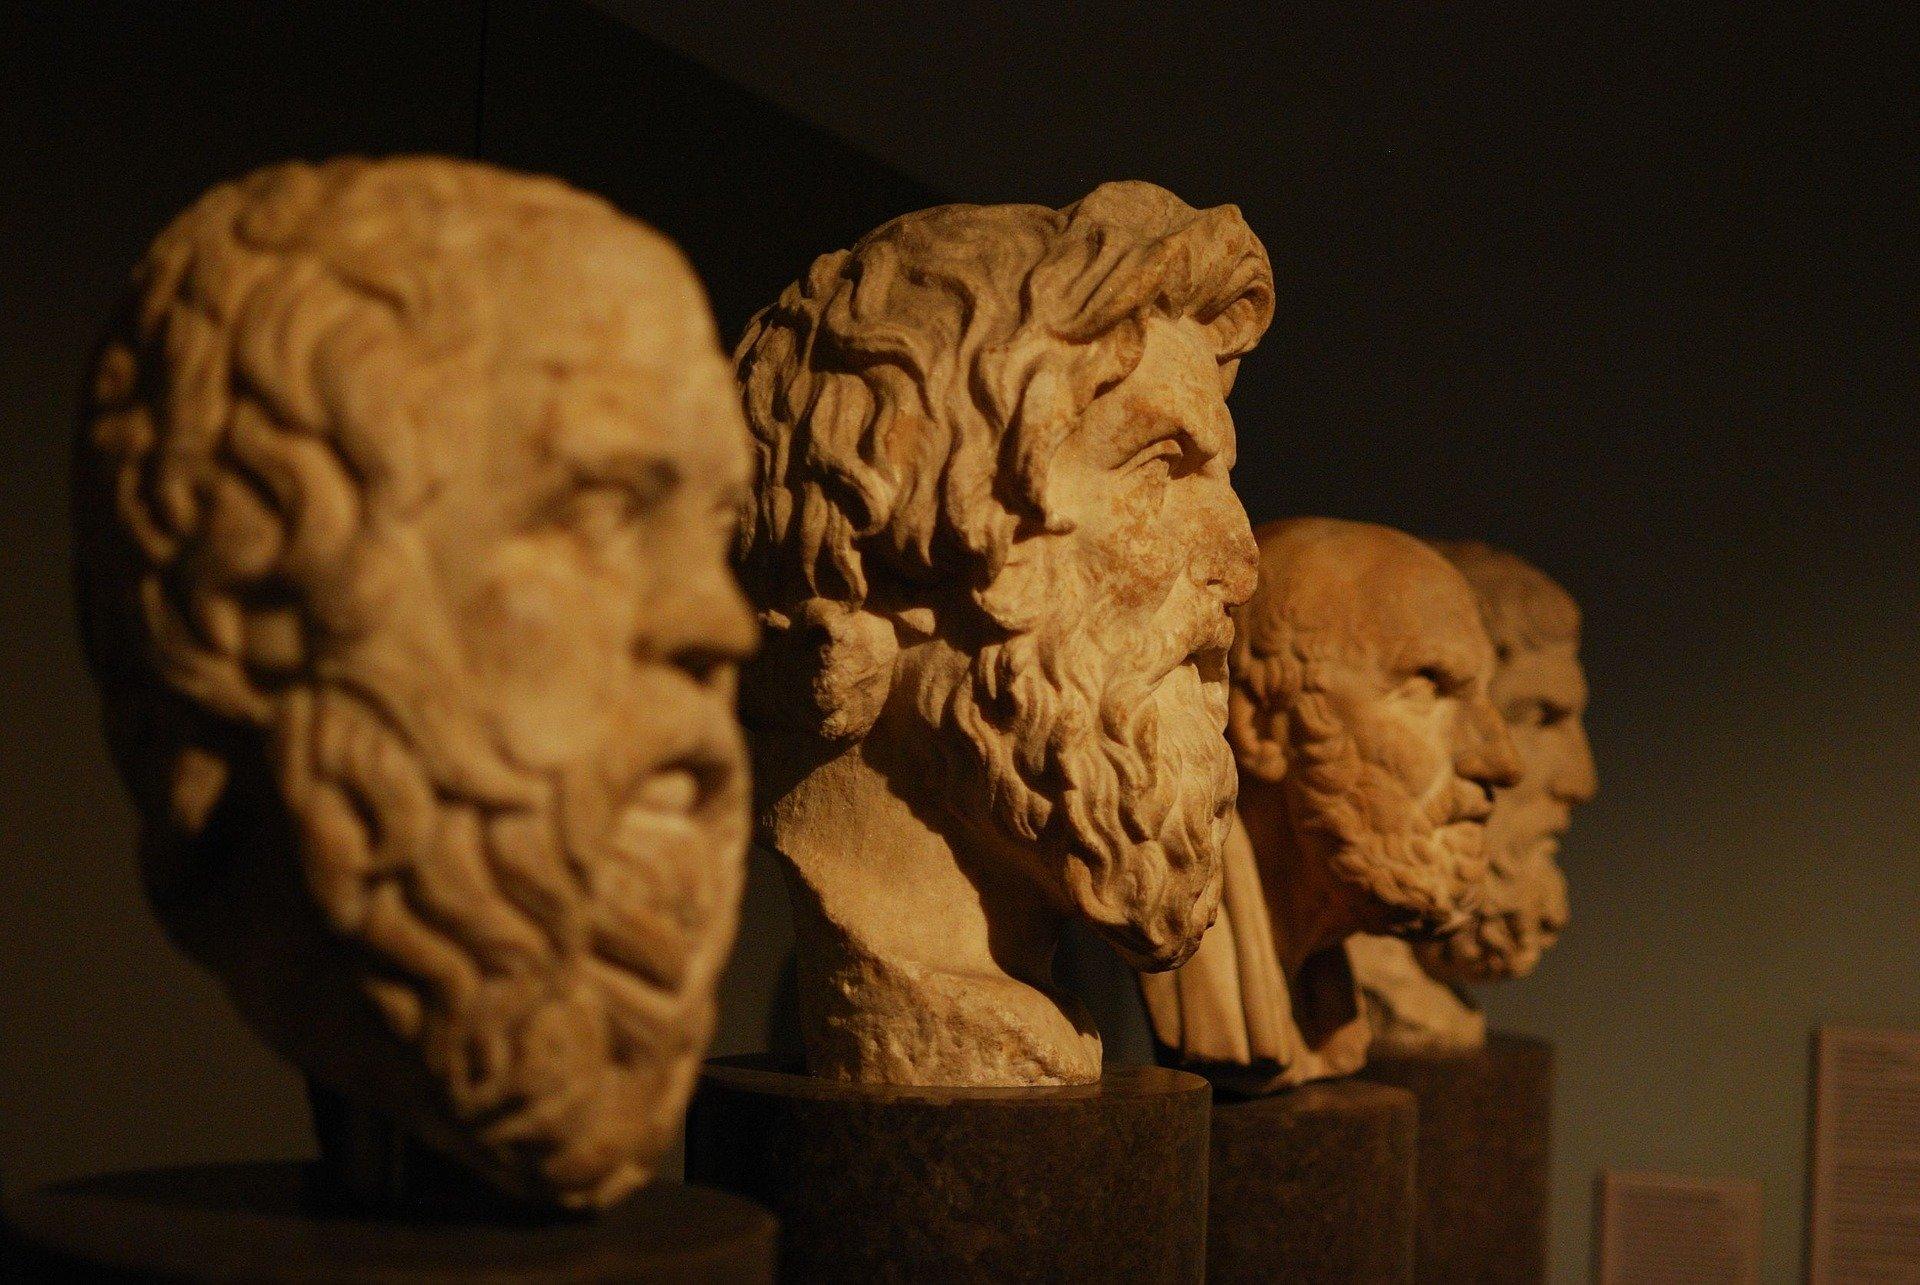 Ancient Greek philospher busts